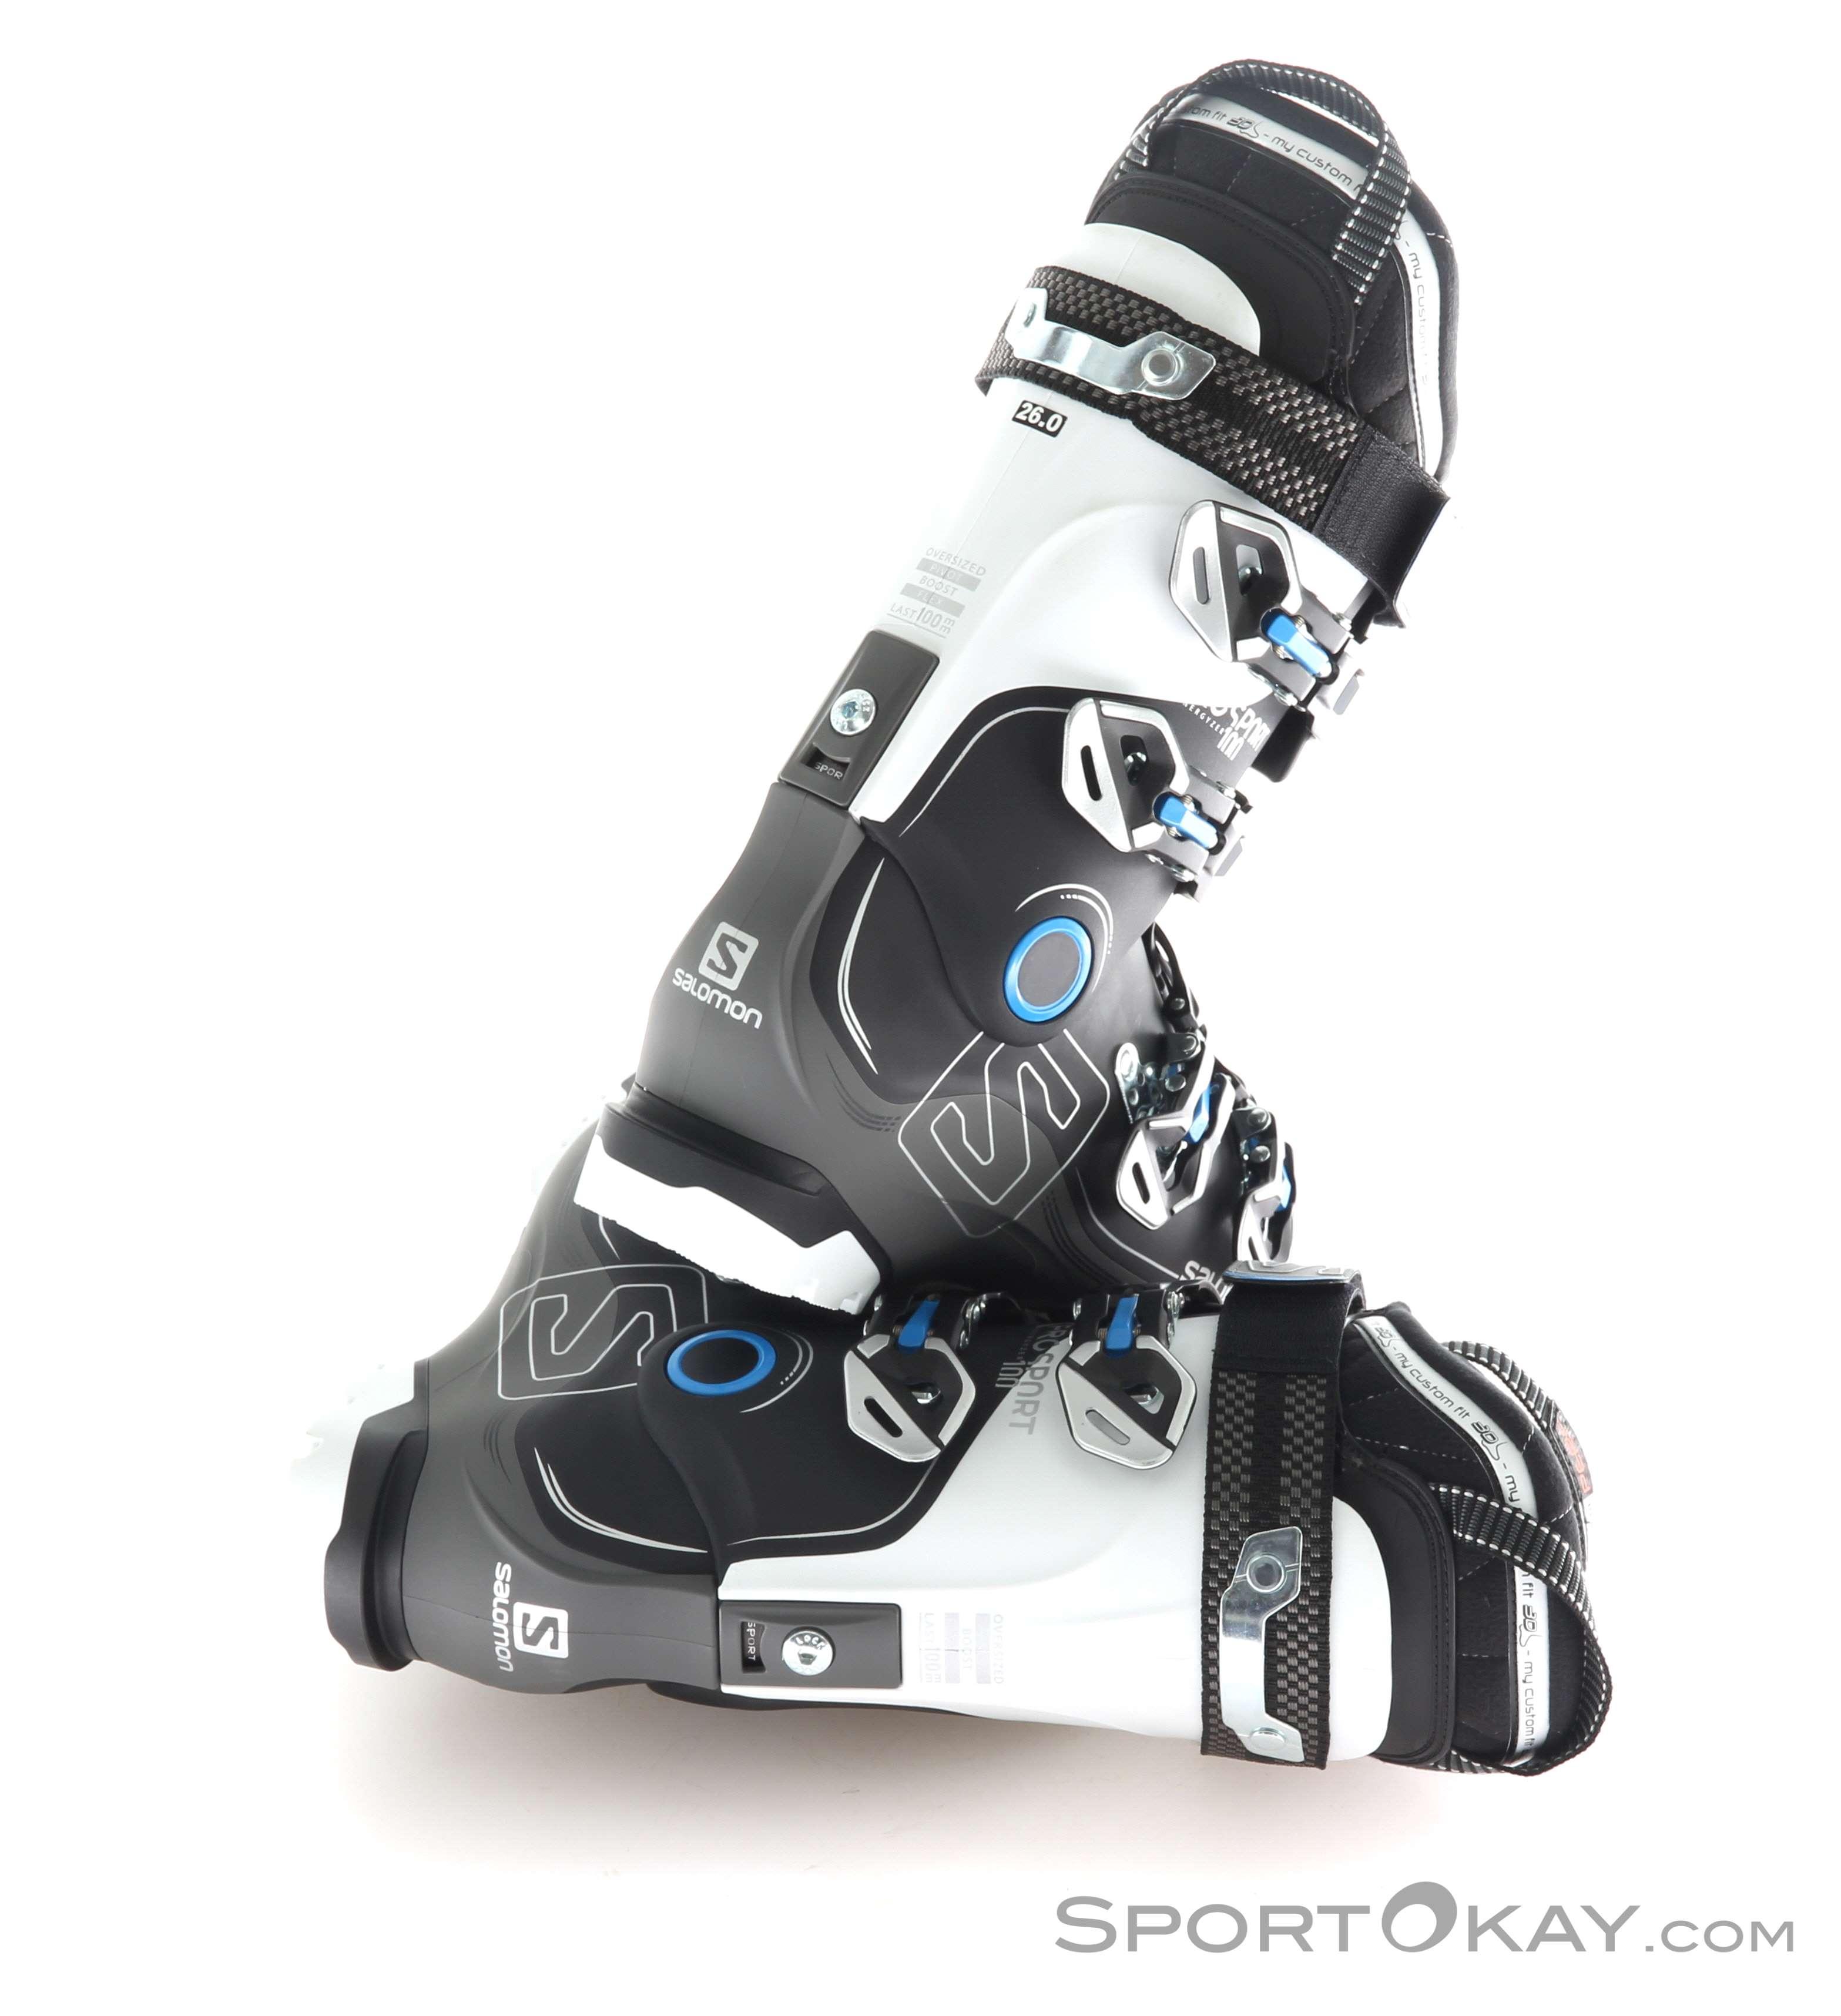 promo code 26940 766e1 Salomon Salomon X Pro Sport 100 Mens Ski Boots